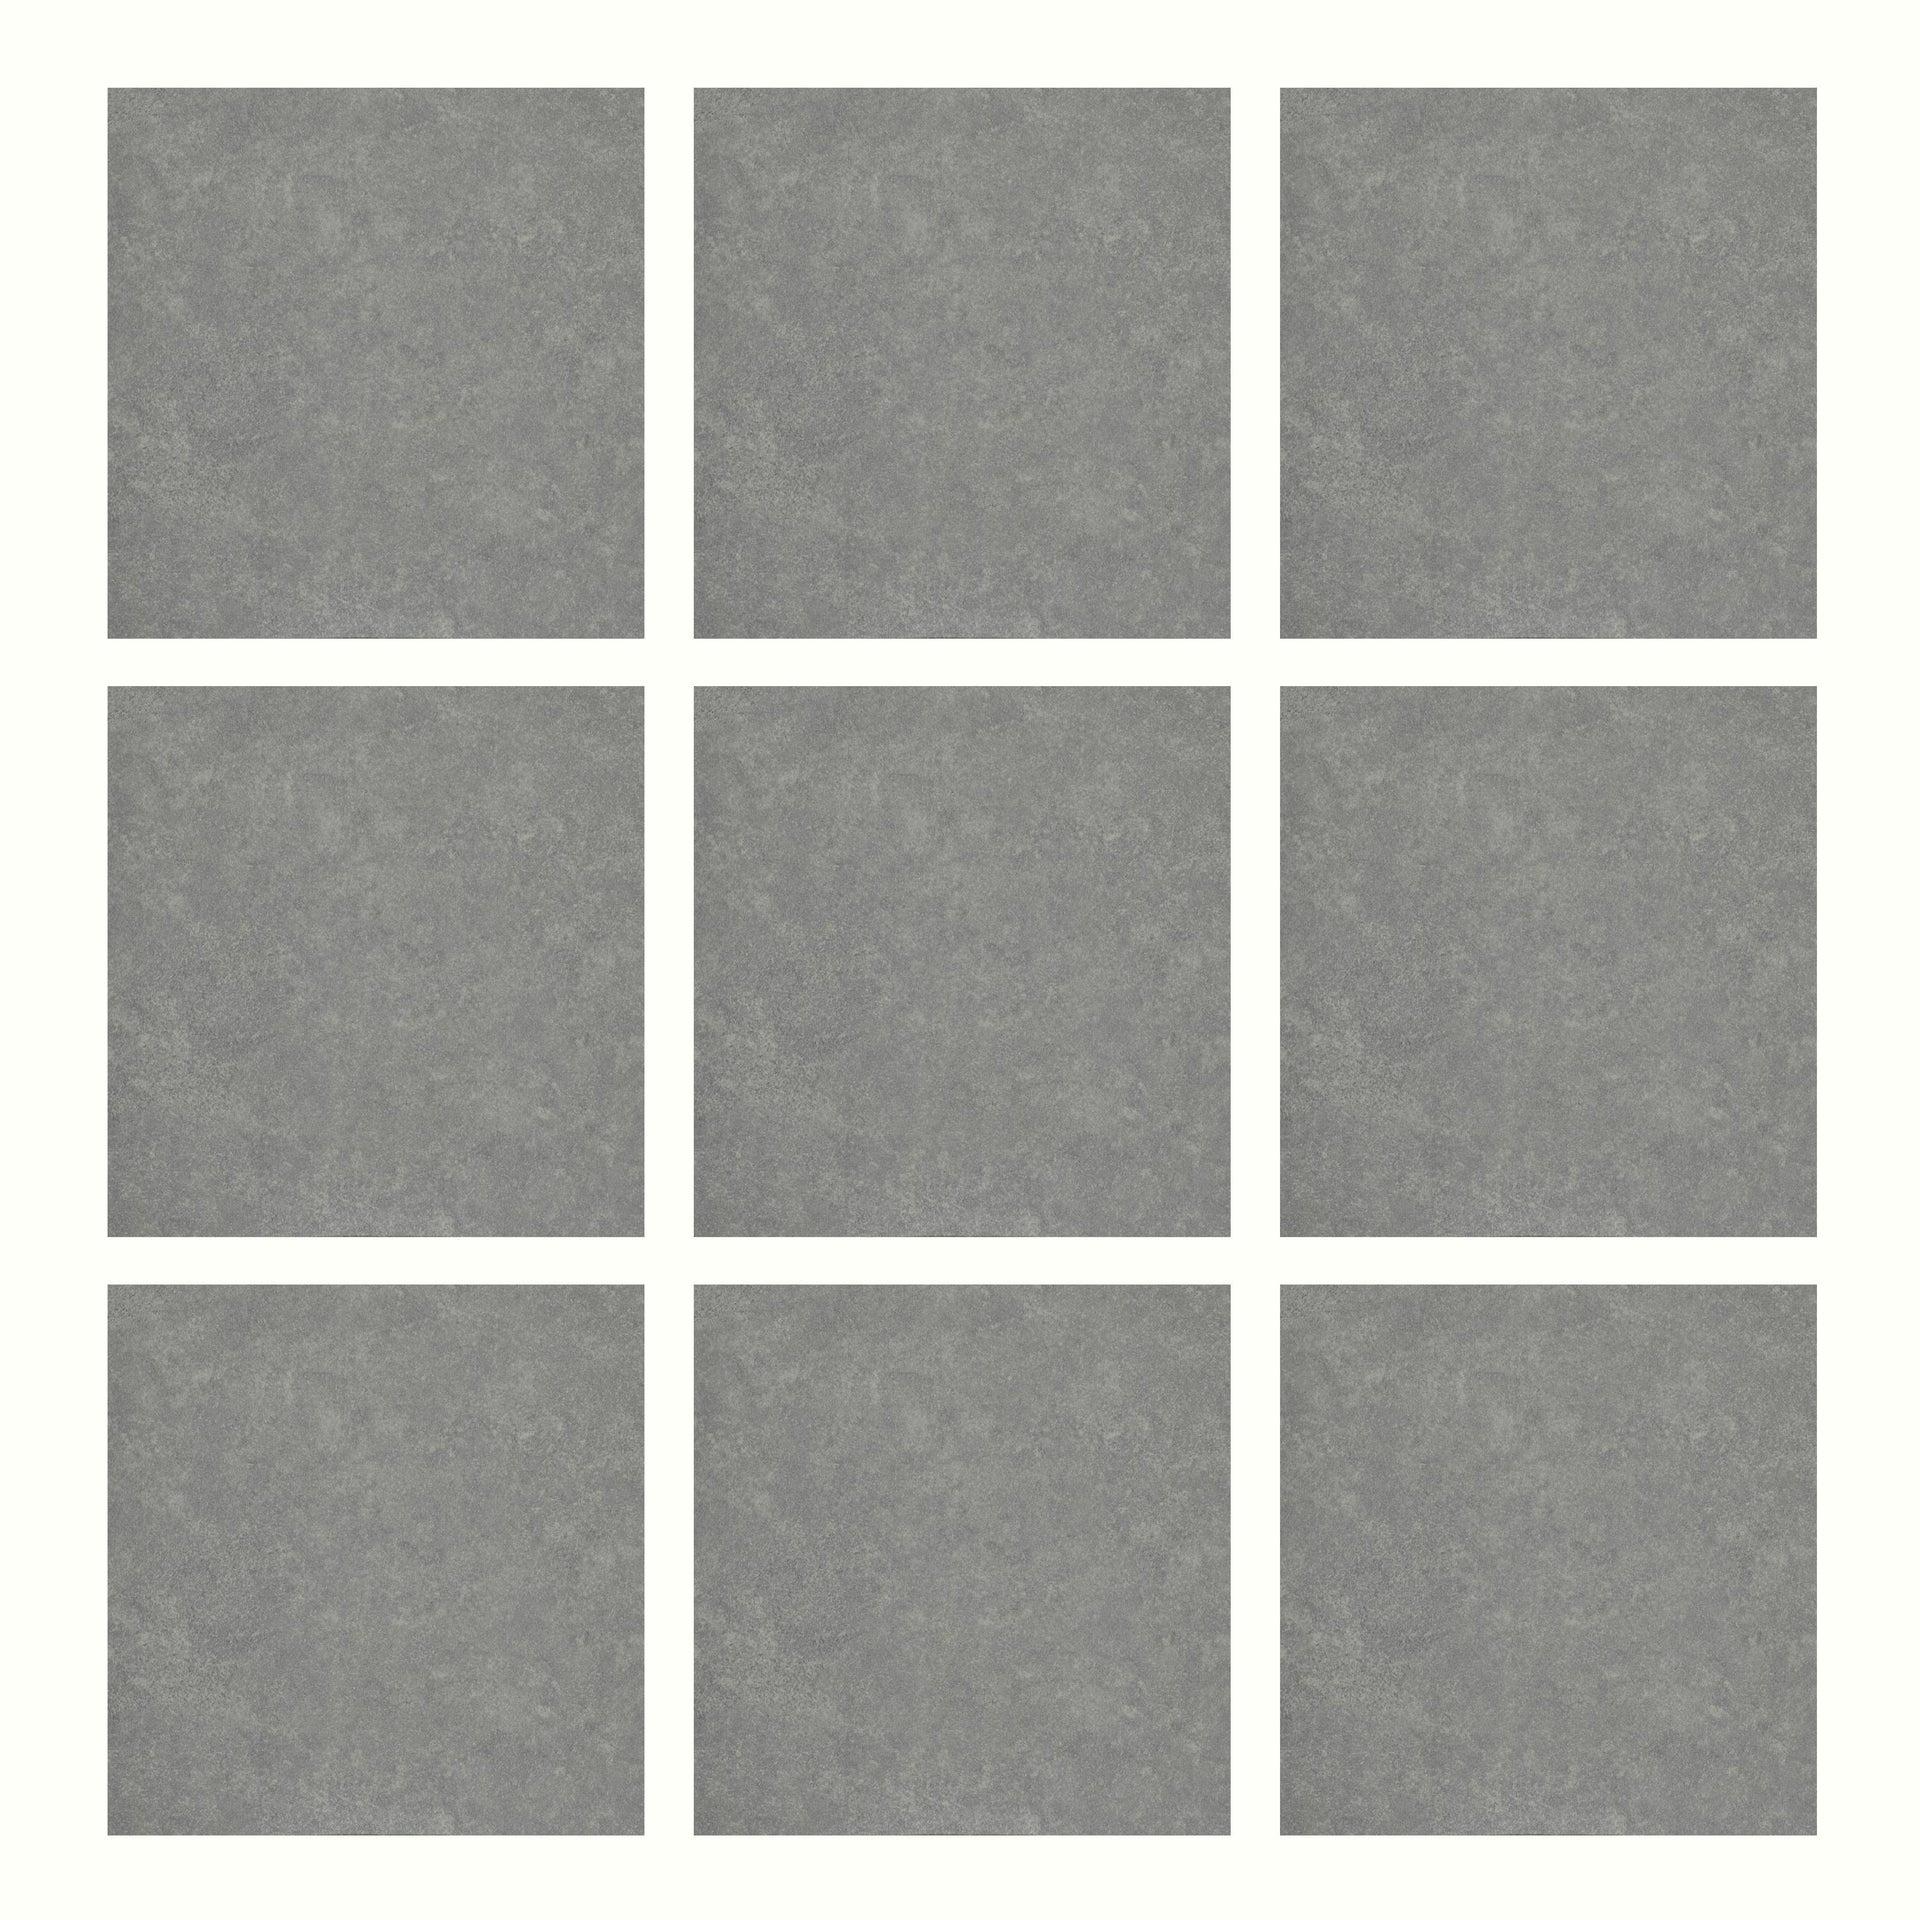 Pavimento PVC adesivo Kamet Sp 1.2 mm grigio / argento - 5